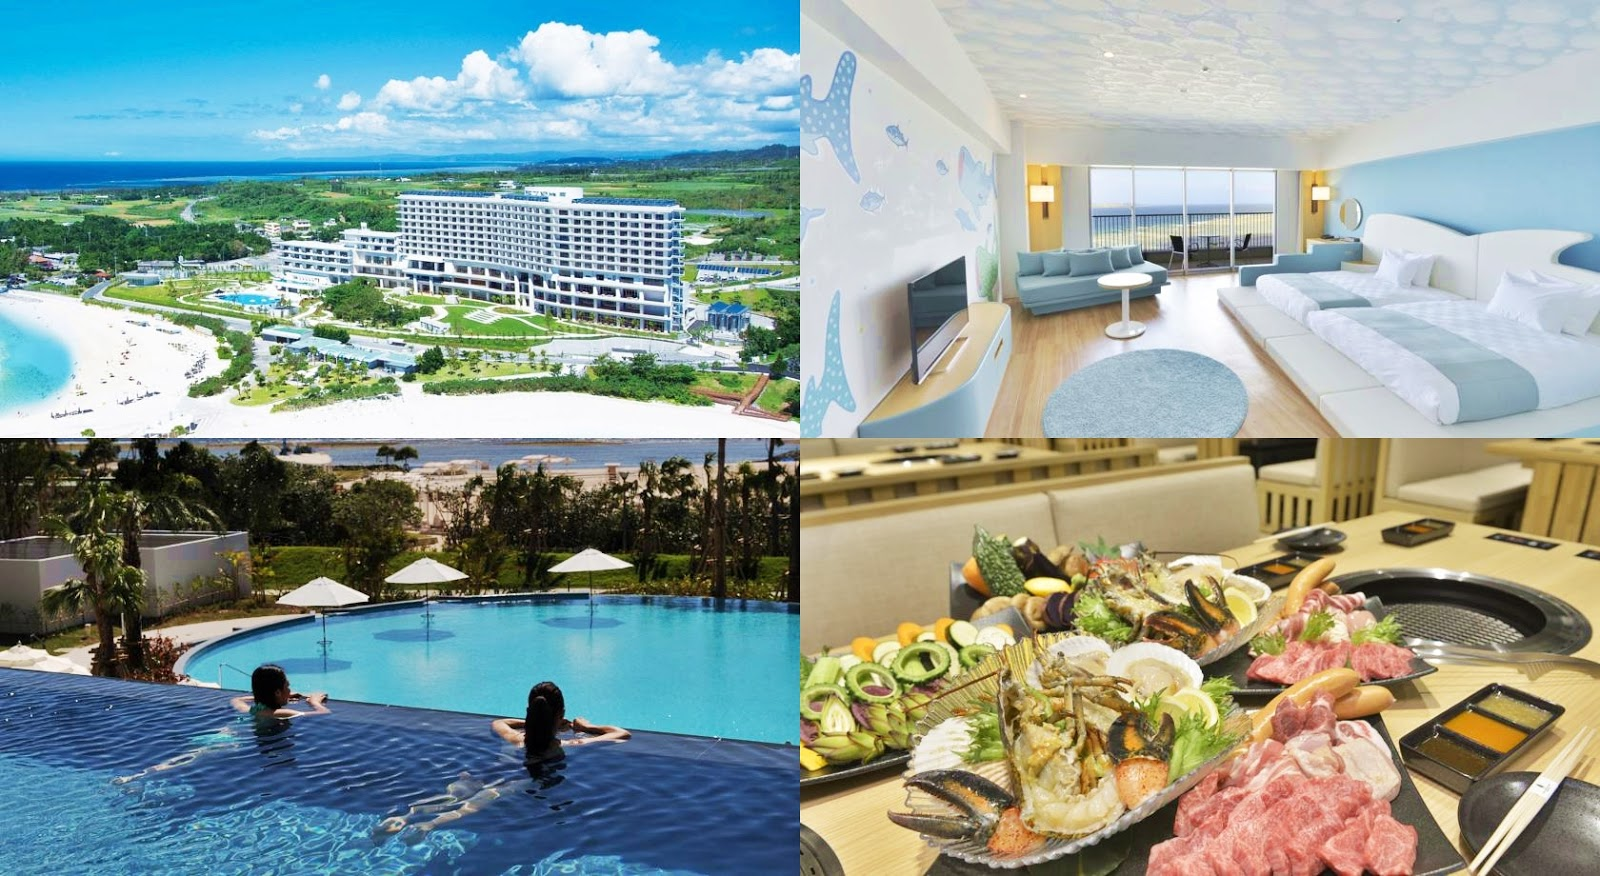 沖繩-住宿-推薦-奧利安酒店本部度假村-Hotel-Orion-Motobu-Resort&Spa-Okinawa-hotel-recommendation